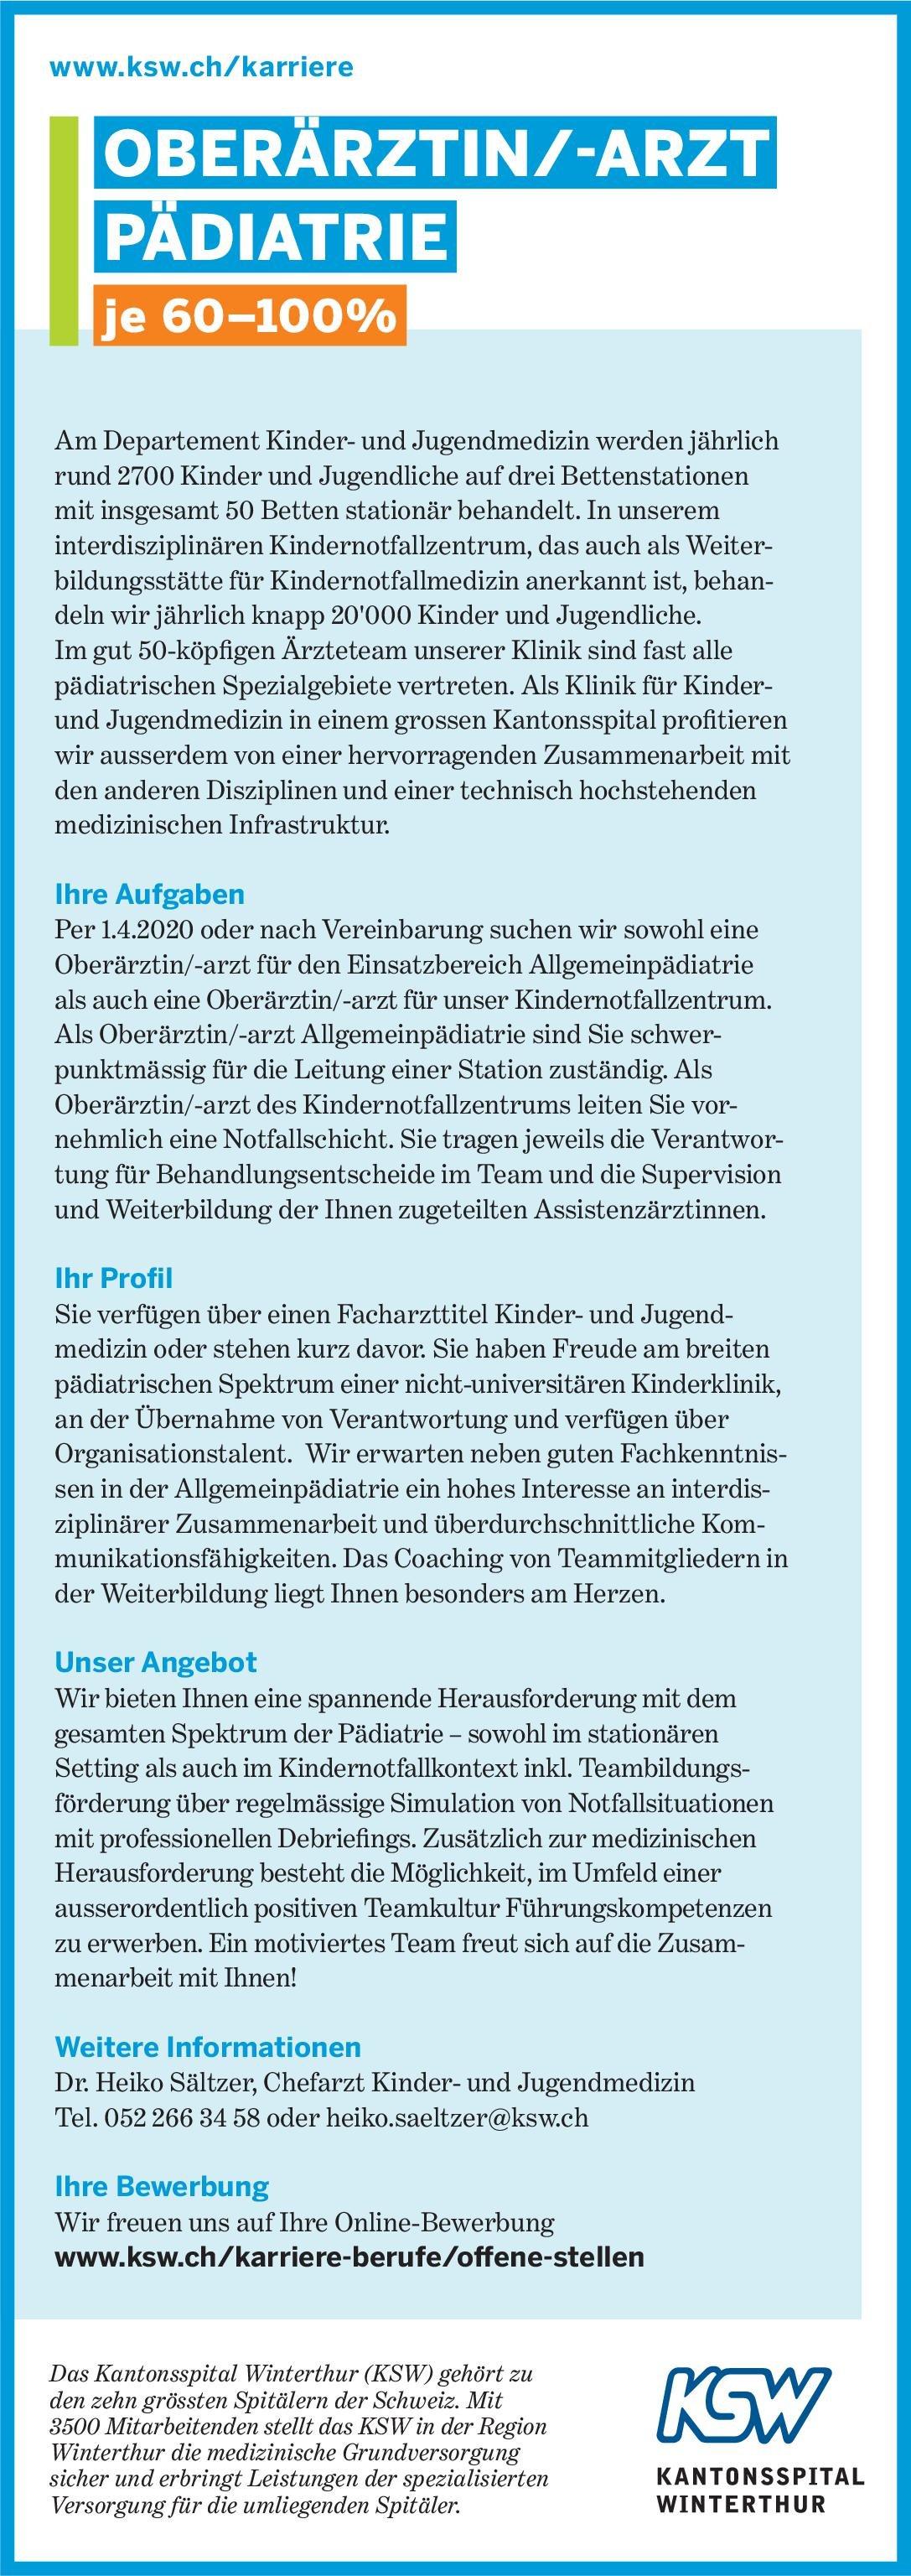 Kantonsspital Winterthur Oberärztin/-arzt Pädiatrie  Kinder- und Jugendmedizin, Kinder- und Jugendmedizin Oberarzt